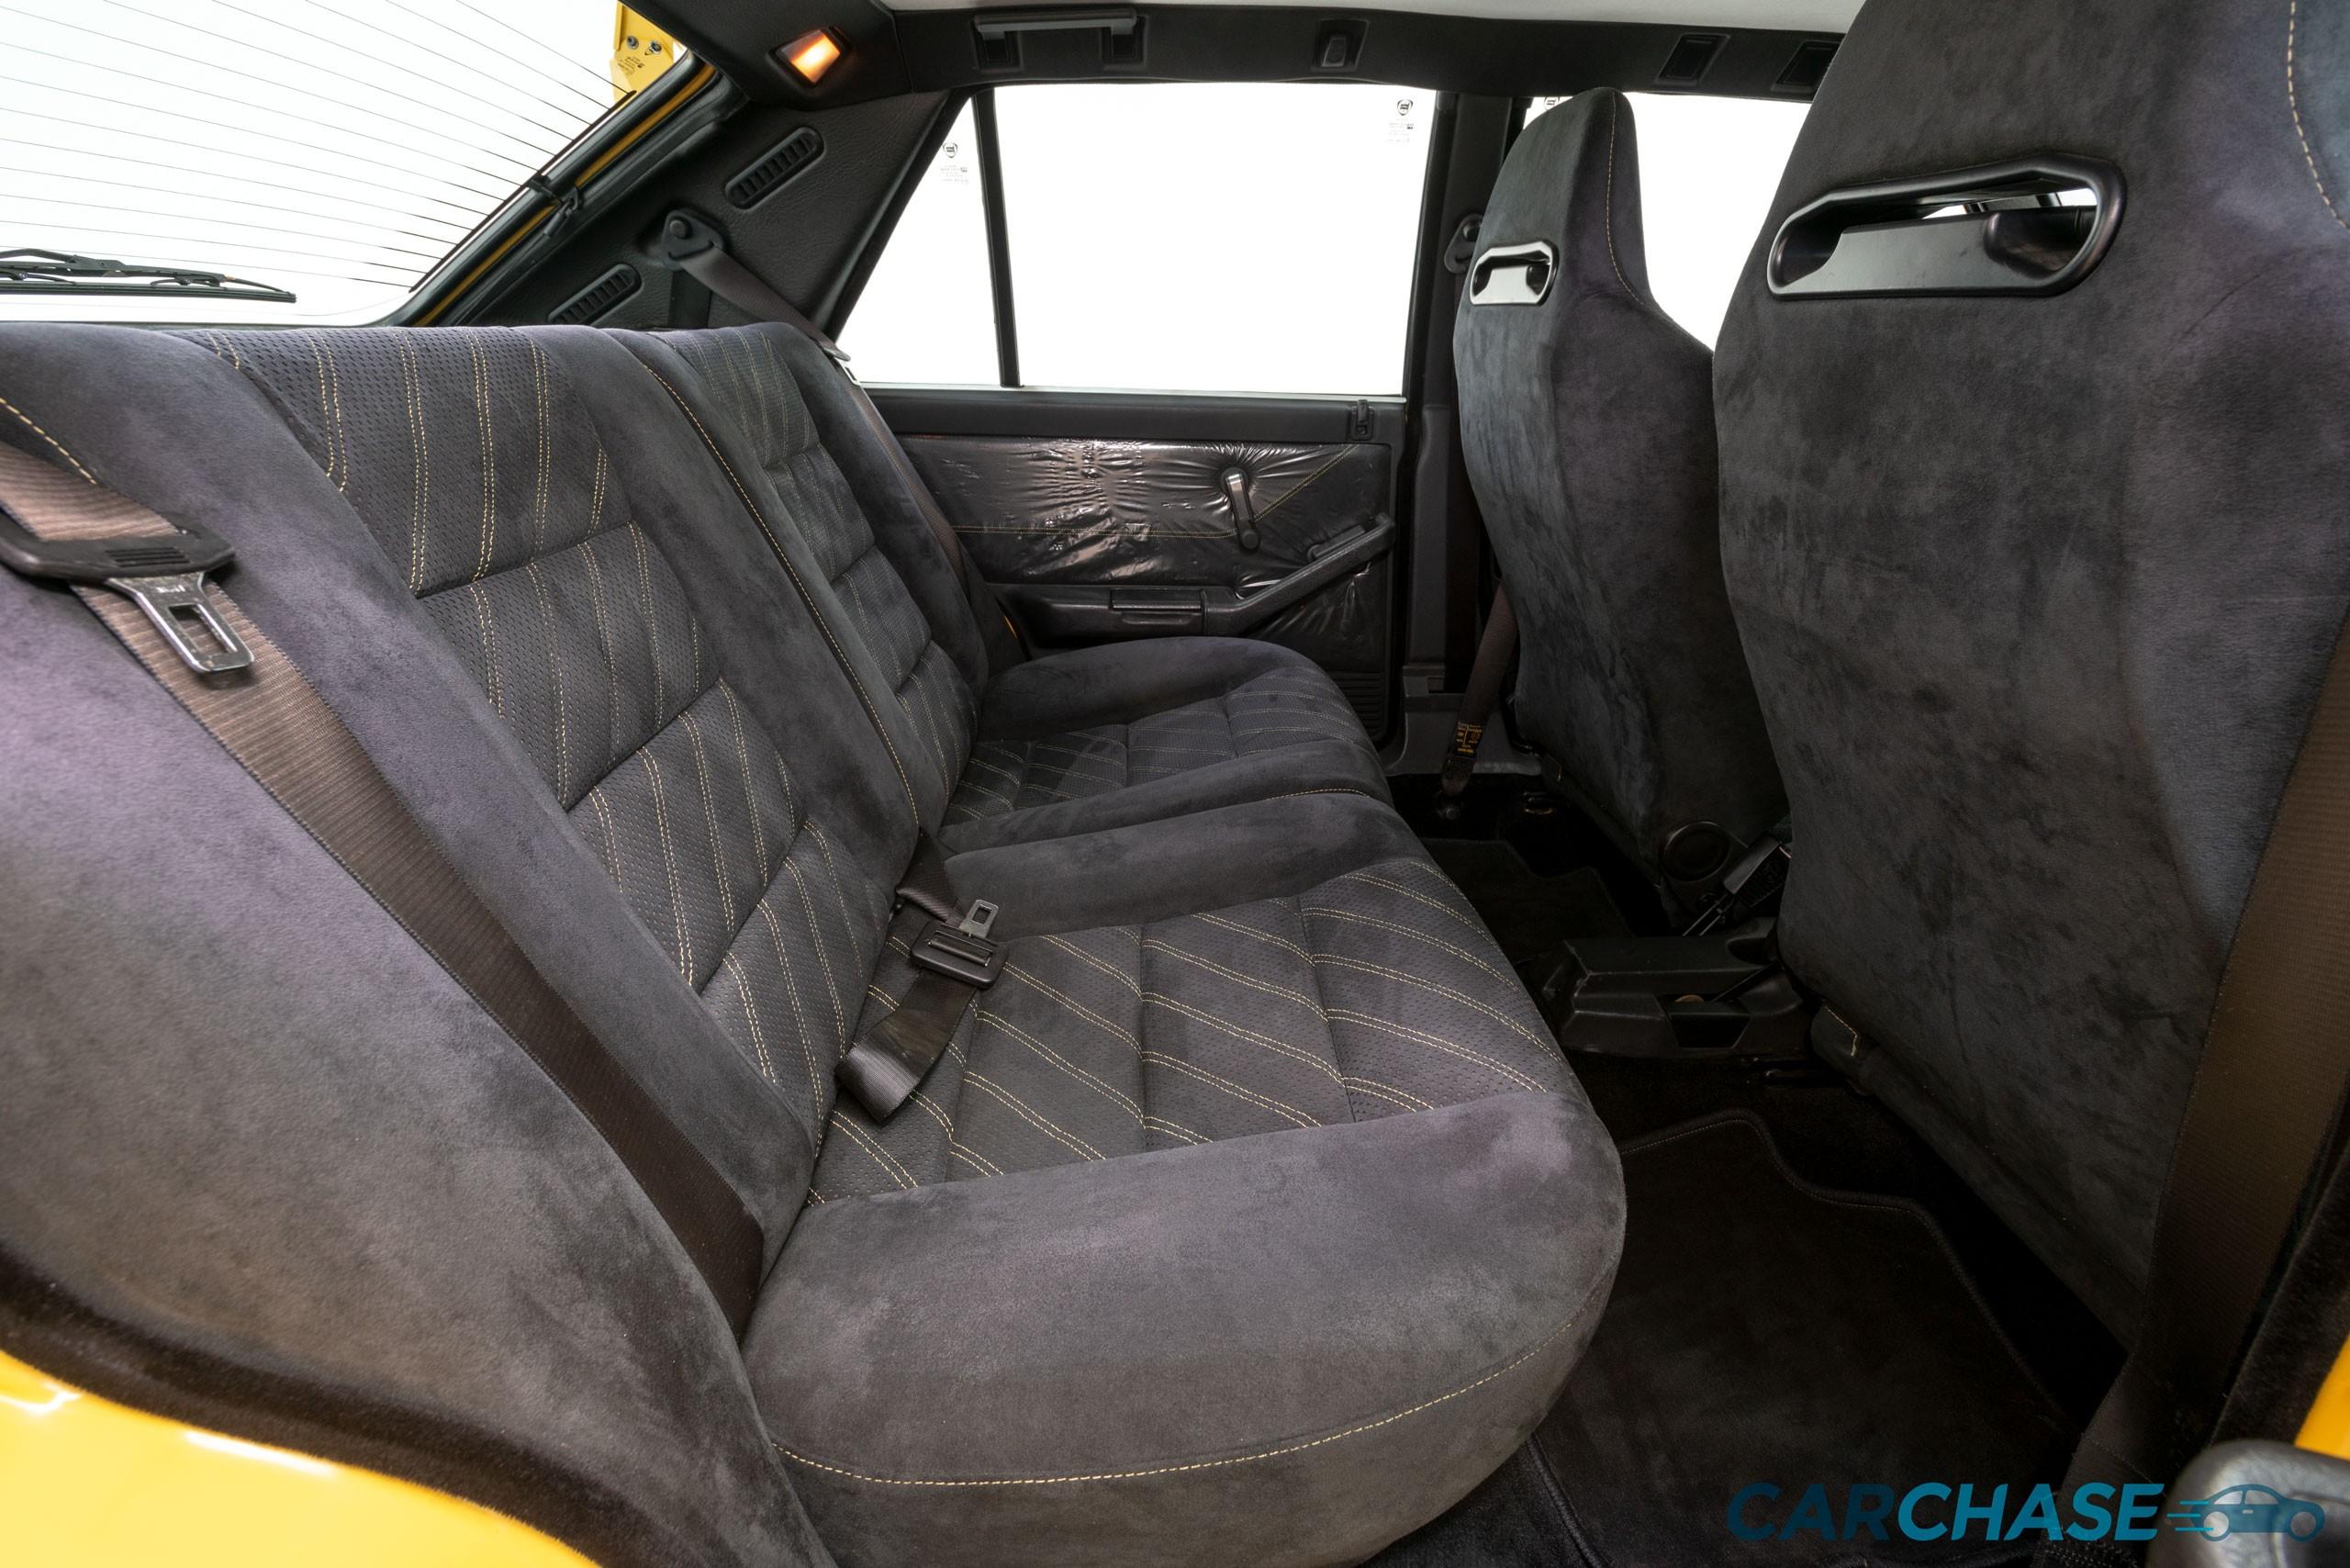 Image of passenger rear profile of 1993 Lancia Delta Integrale Evo 2 Giallo Ginestra